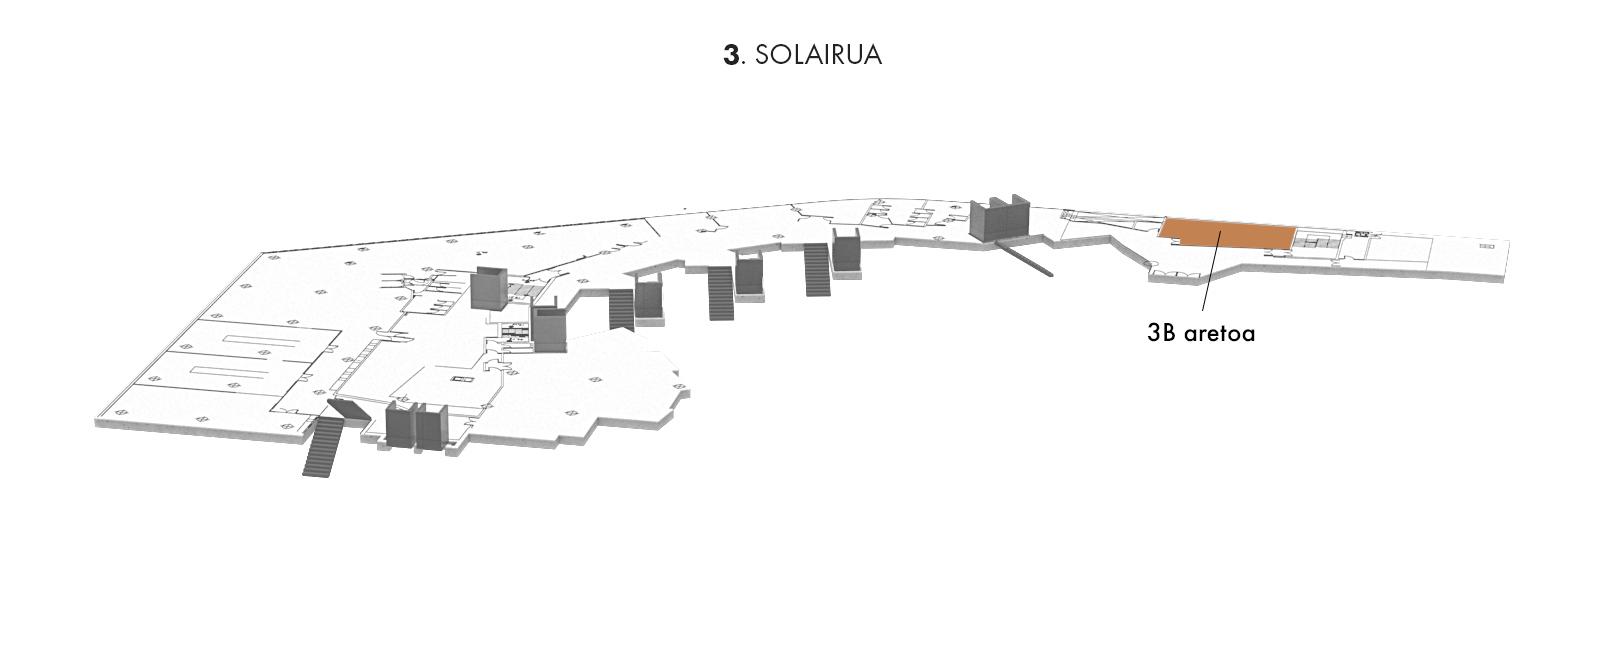 3B aretoa, 3. solairua | Palacio Euskalduna Jauregia